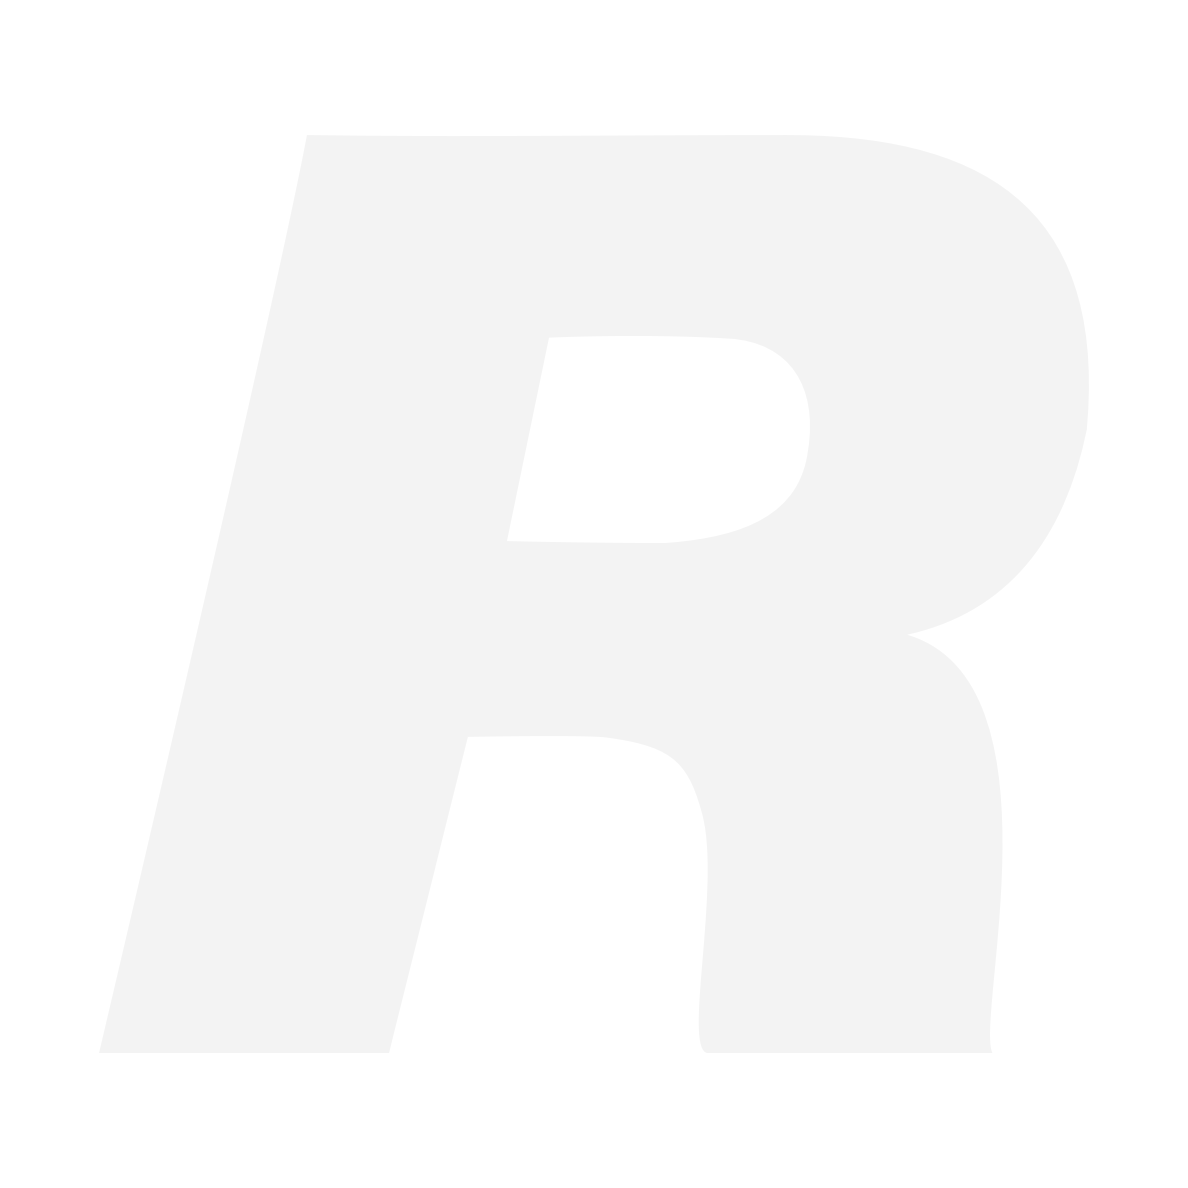 Ortlieb Protect Graphite -vesitiivis kameralaukku